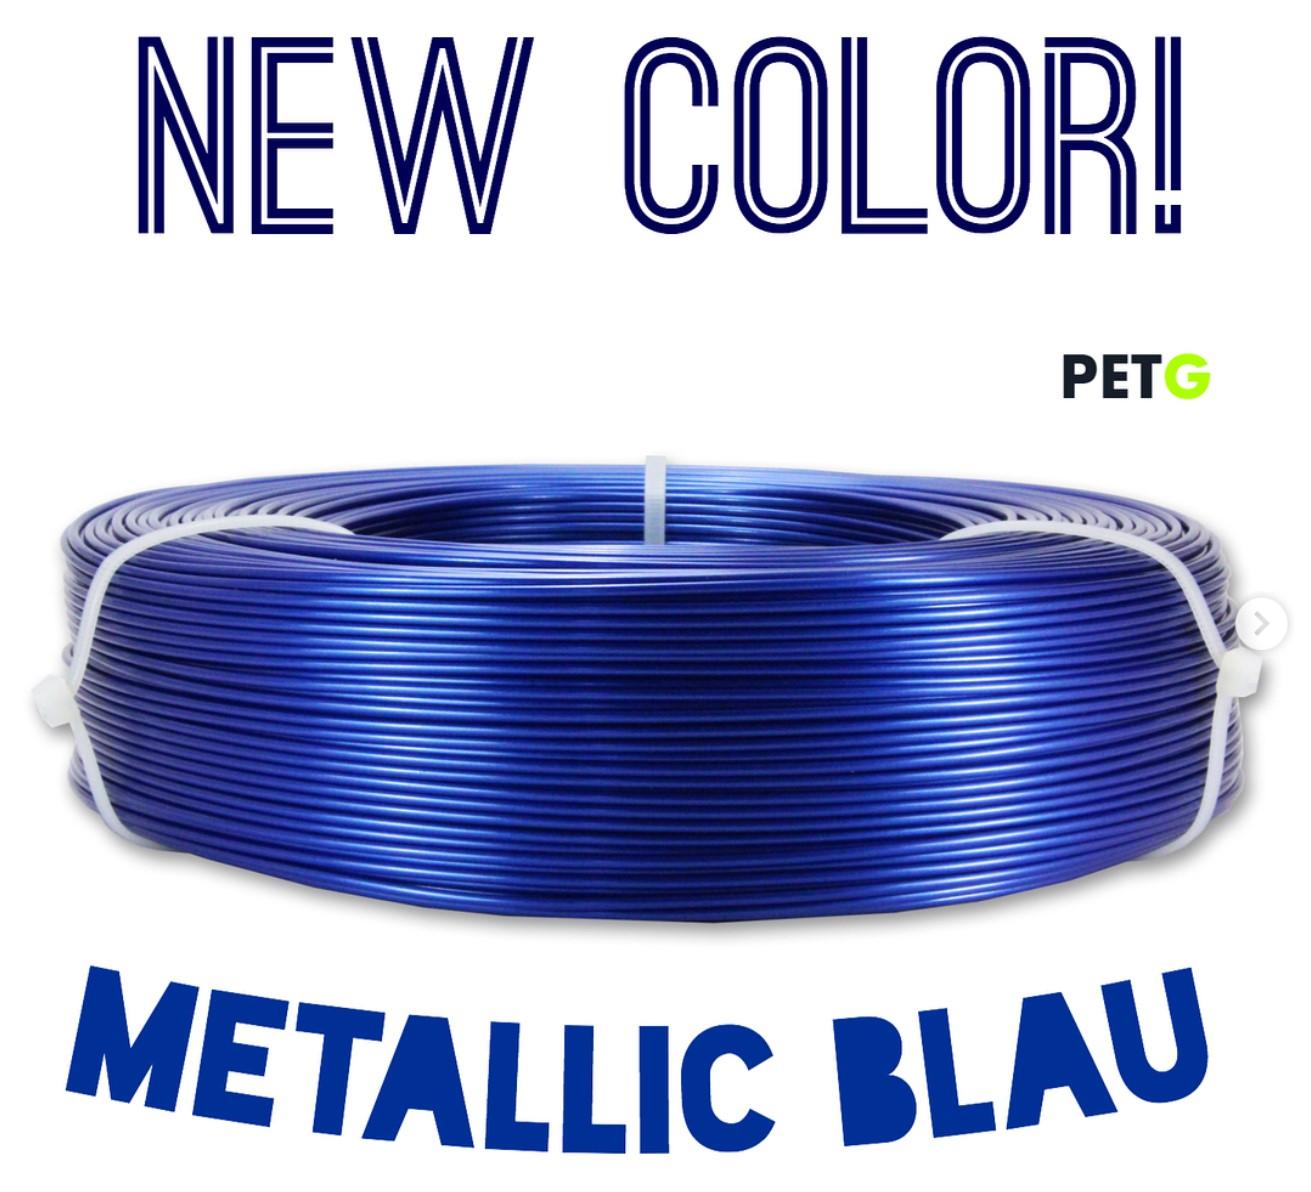 Neue PETG Farbe: Metallic Blau!